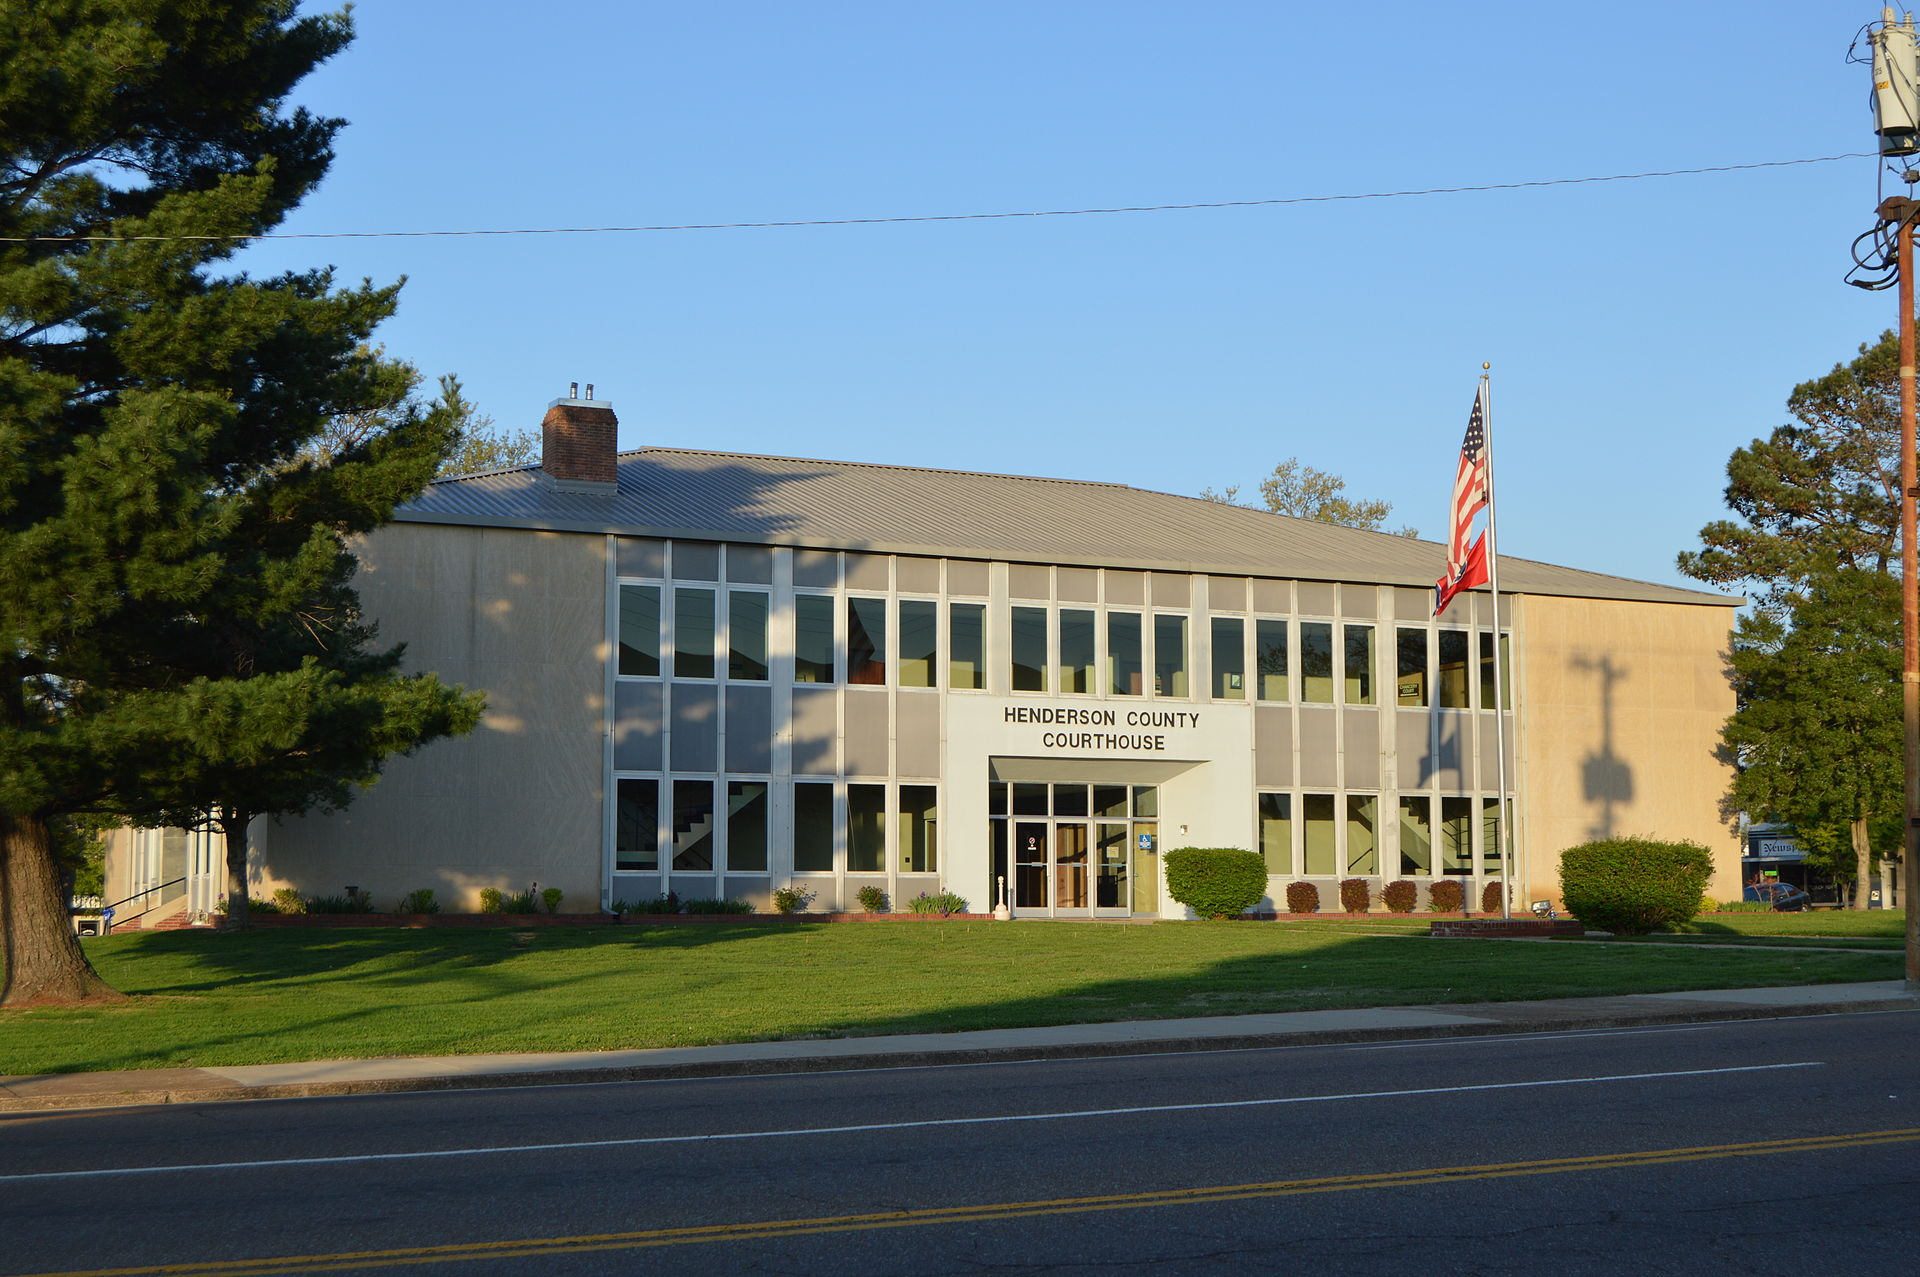 Henderson_County_Courthouse,_Lexington